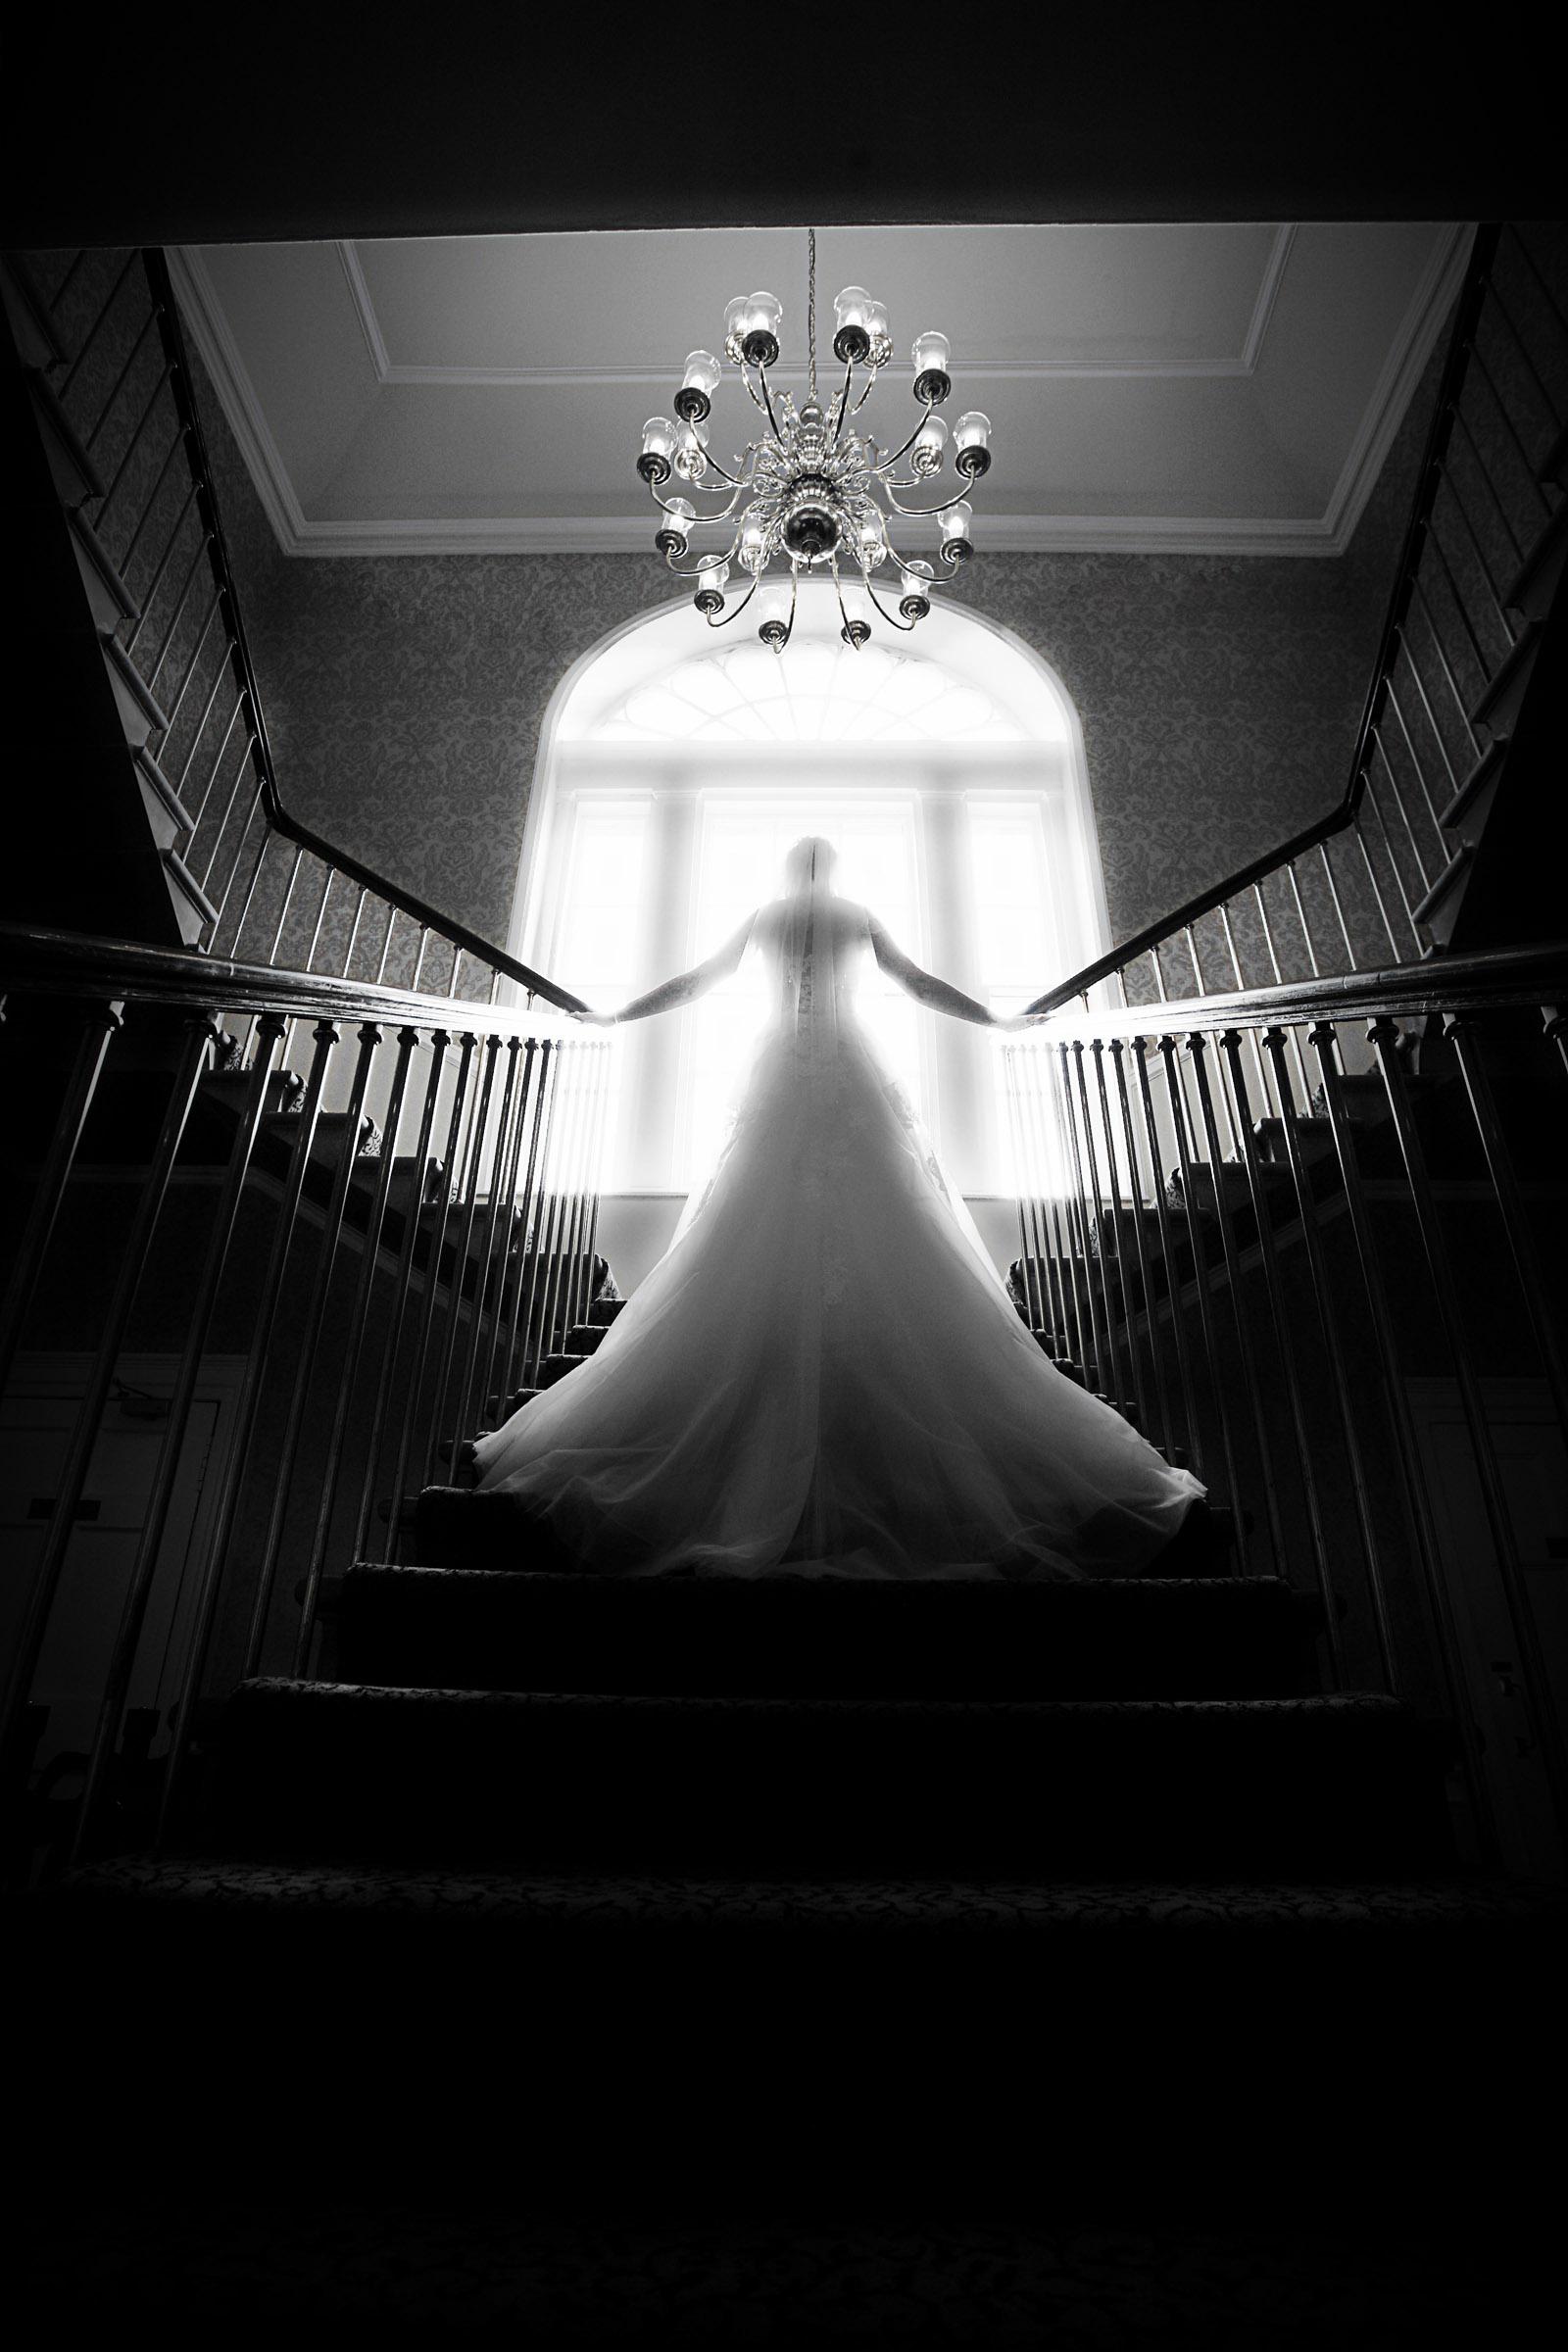 Classic_Bridal_staircase_photograph.jpg